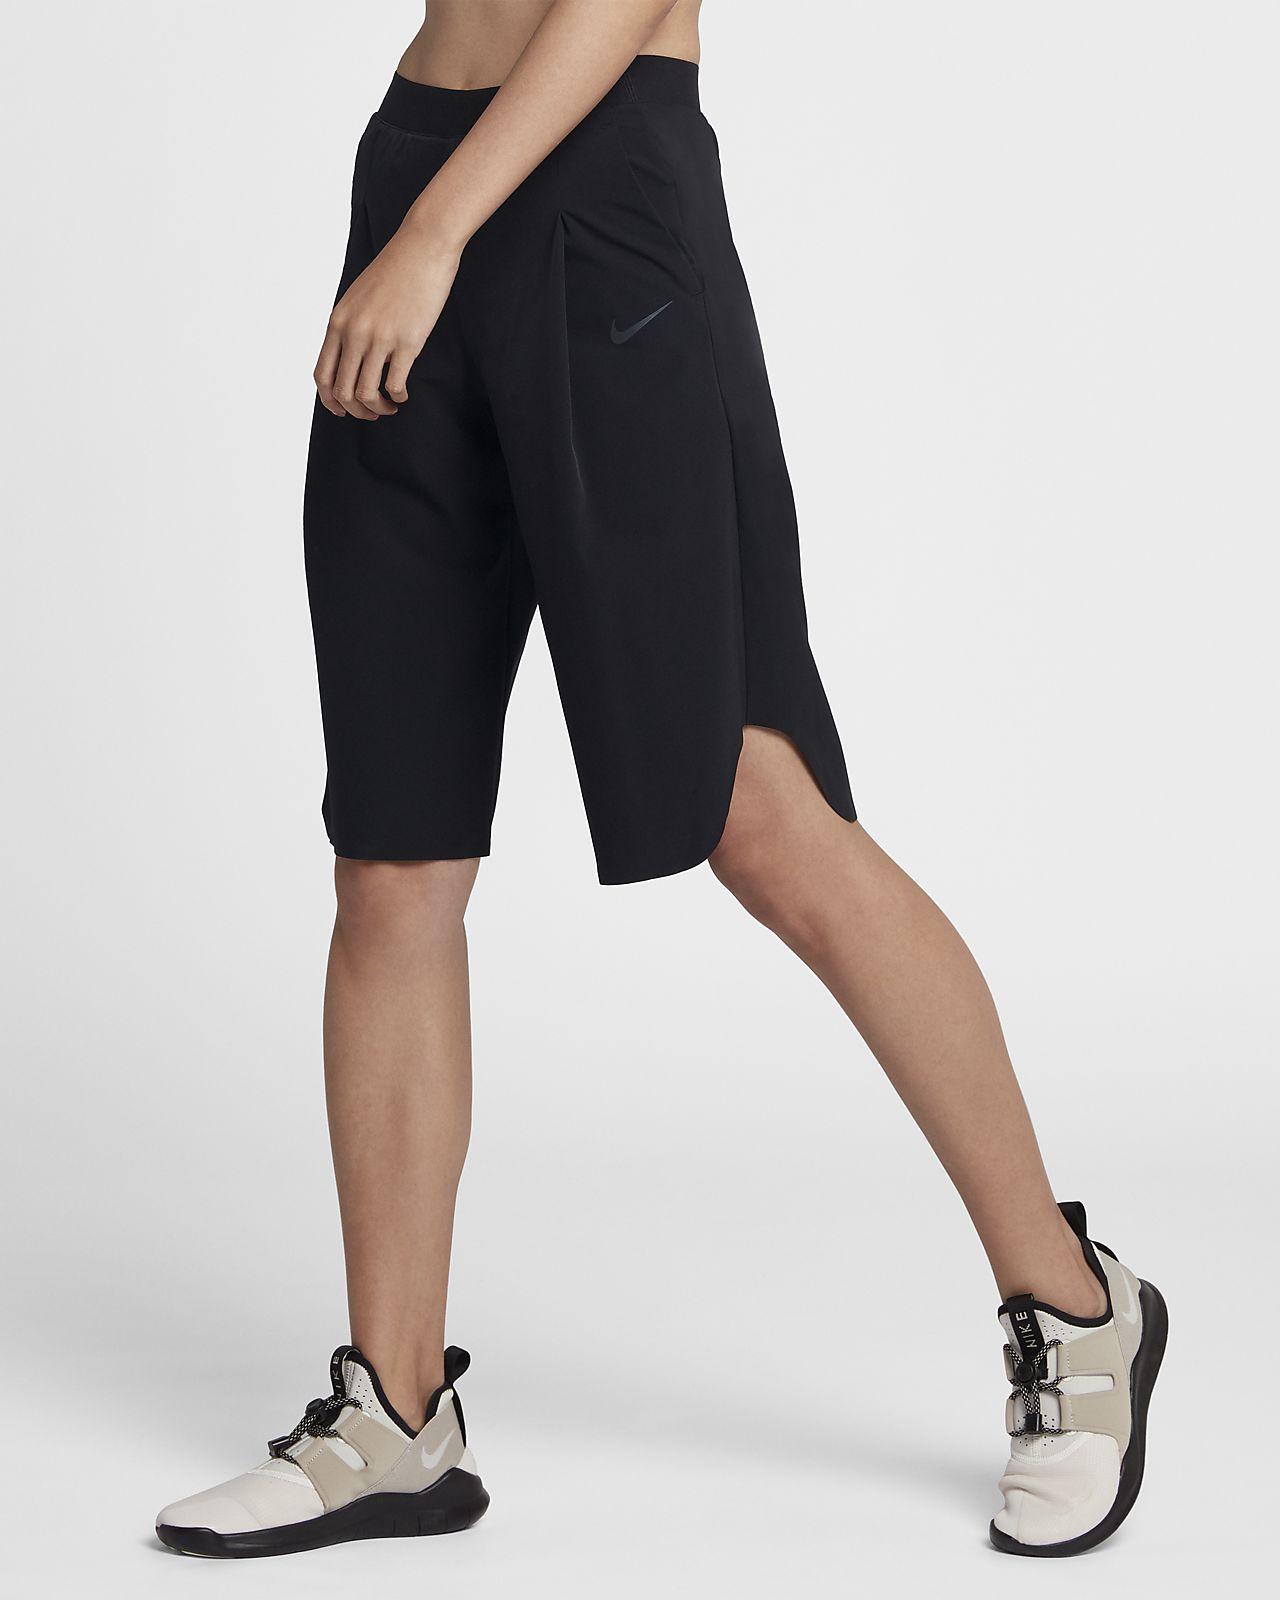 De Pour Ca Short Nike Wtxgx Run Running Femme Long Division 0kPOwn